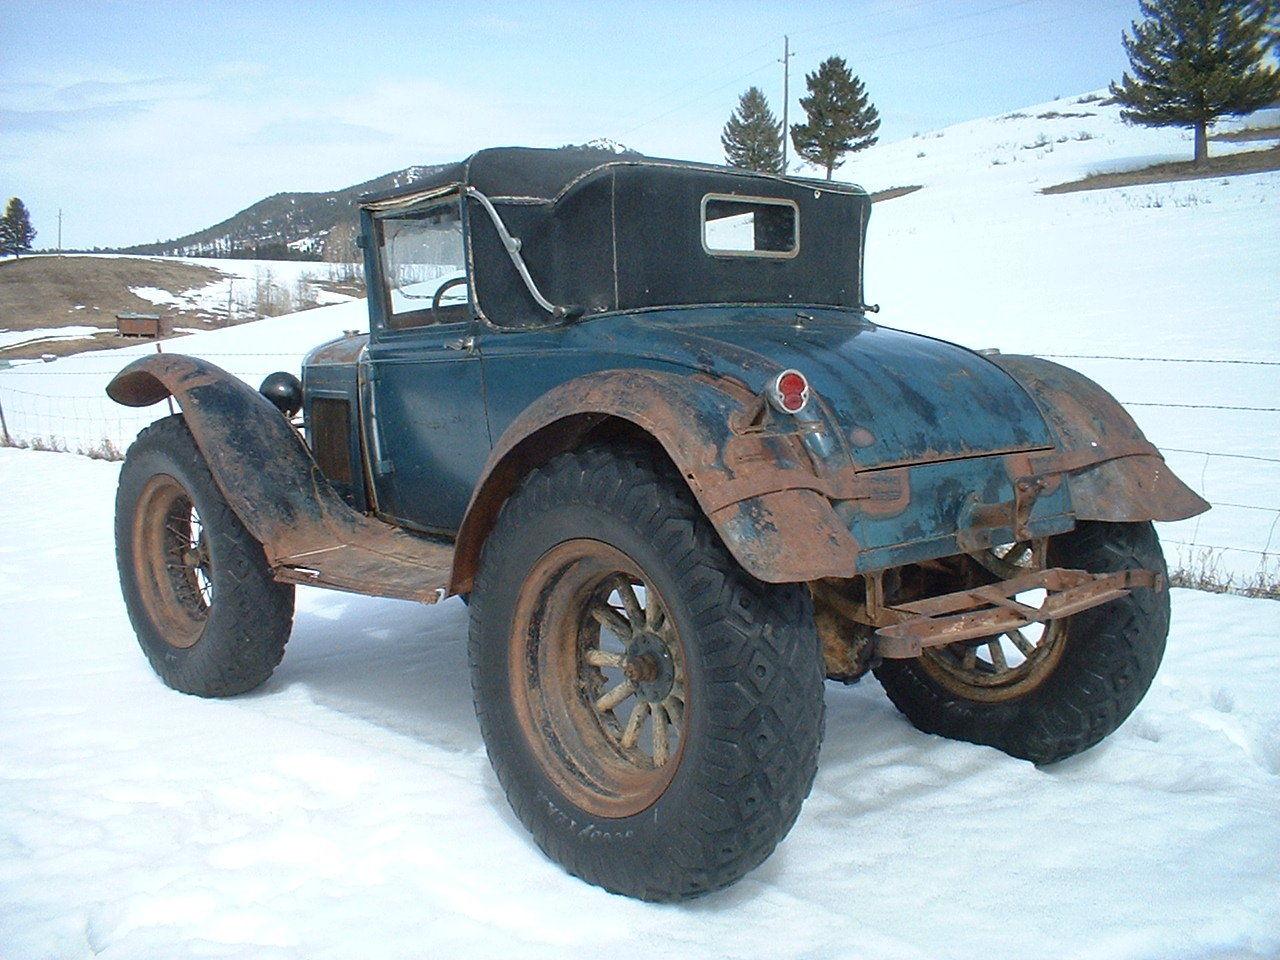 Automotive American - Cool cars 4x4